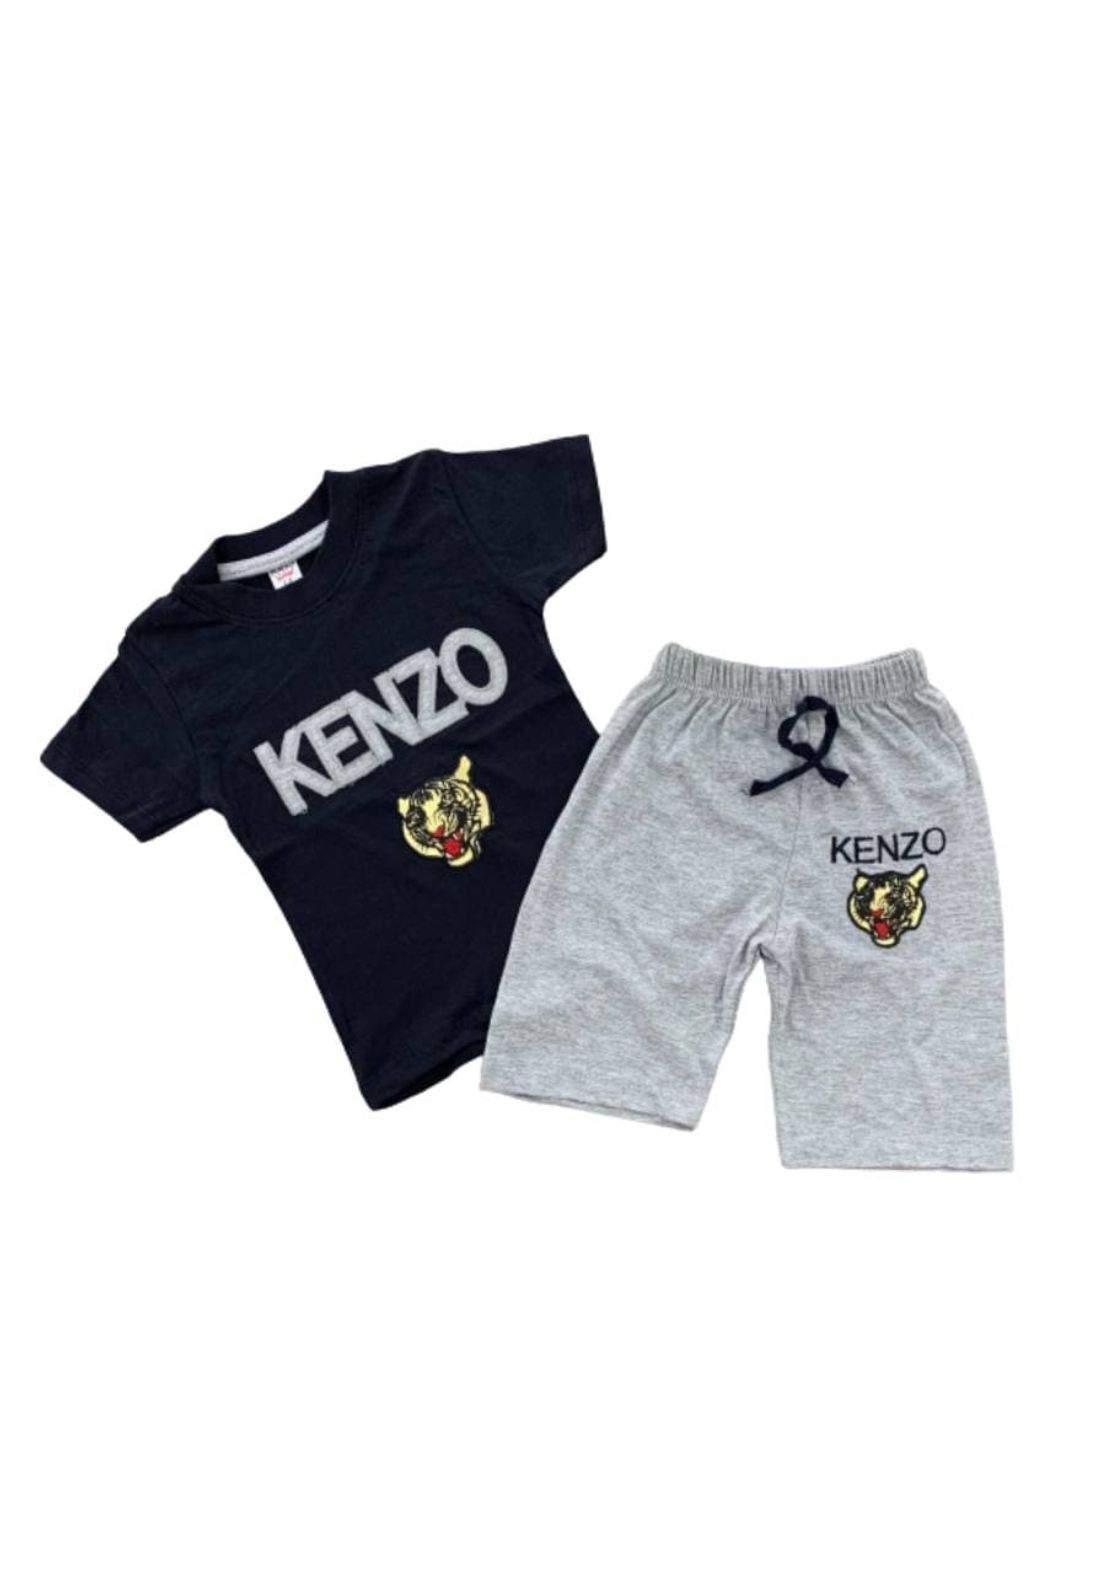 tracksuit for boys  black (t-shirt+short) ( تراكسوت ولادي  اسود (شورت و تيشيرت